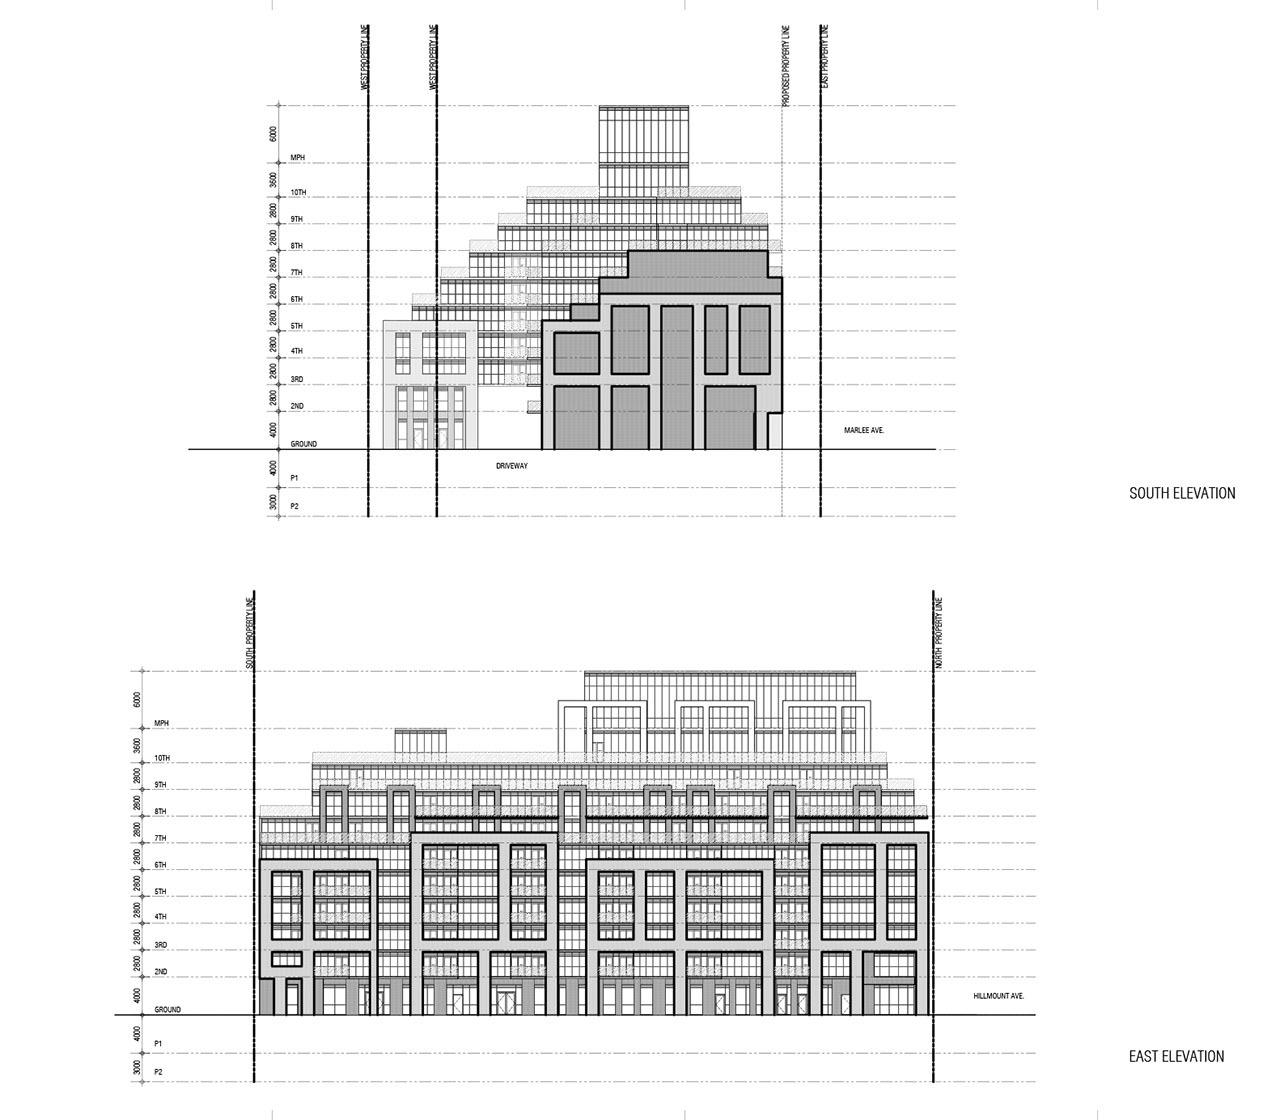 412 Marlee, Altree Developments, Graziani + Corazza Architects, Toronto